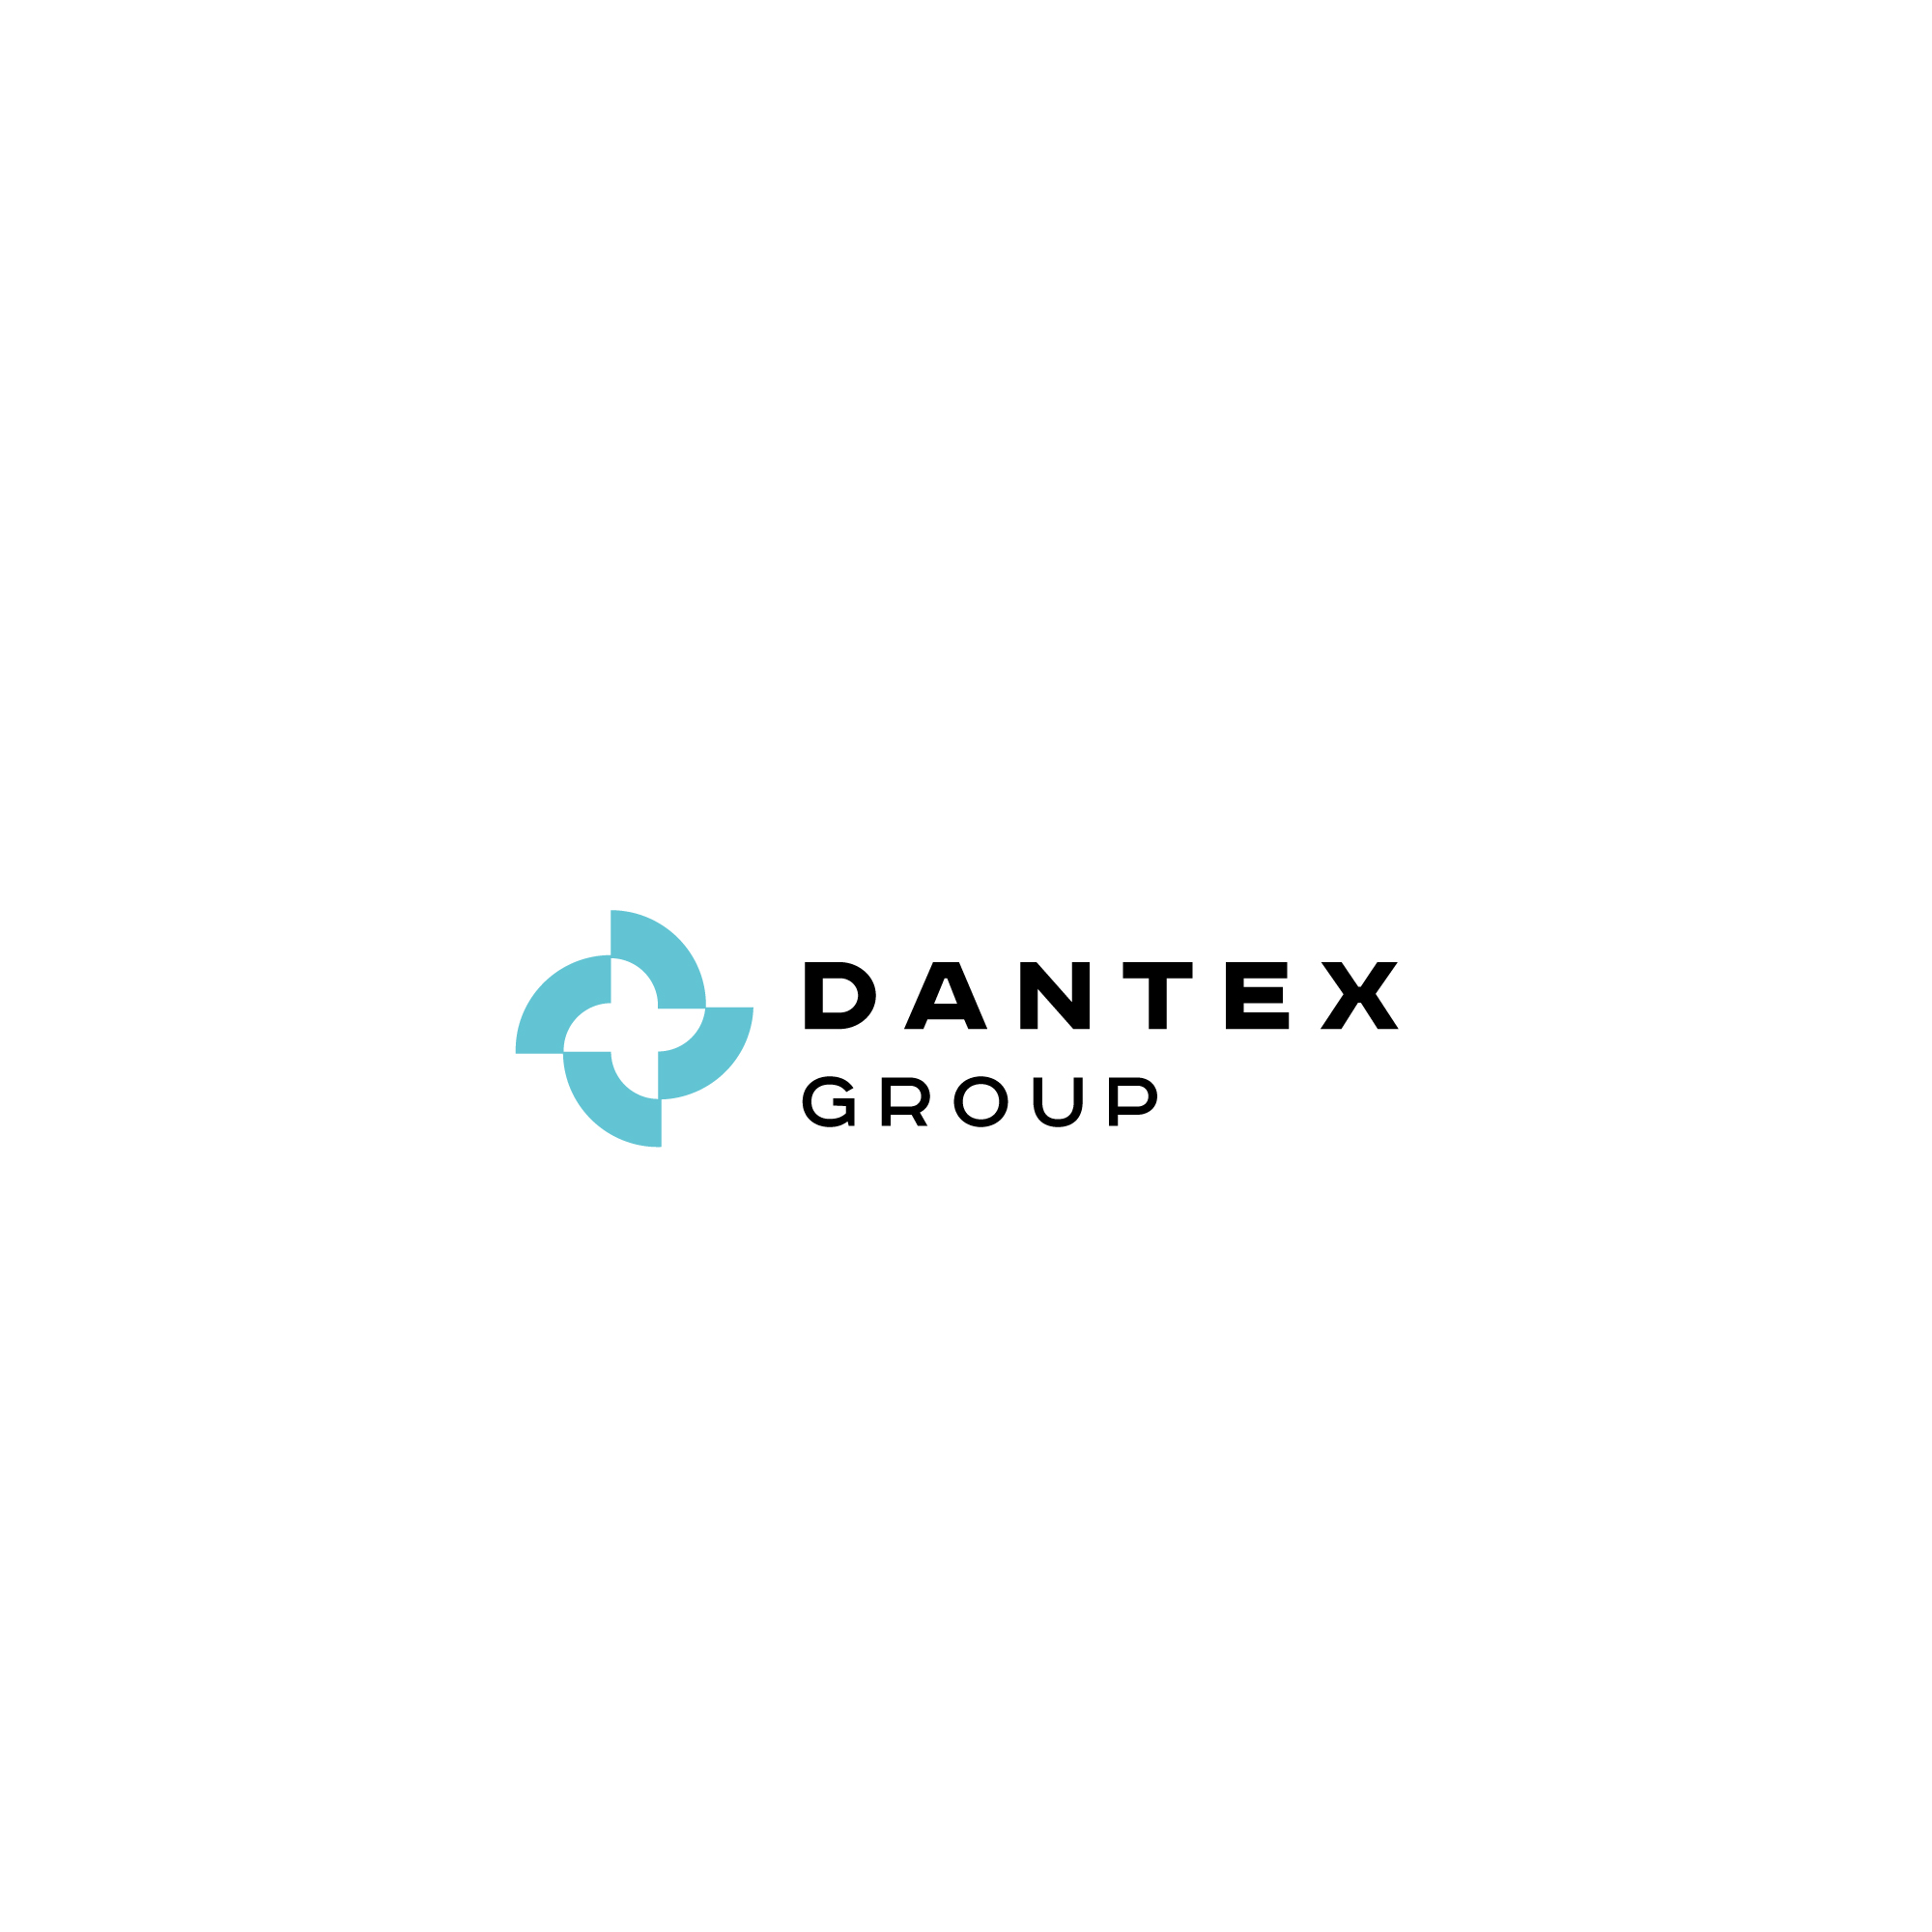 Конкурс на разработку логотипа для компании Dantex Group  фото f_2245bfee775b479a.jpg